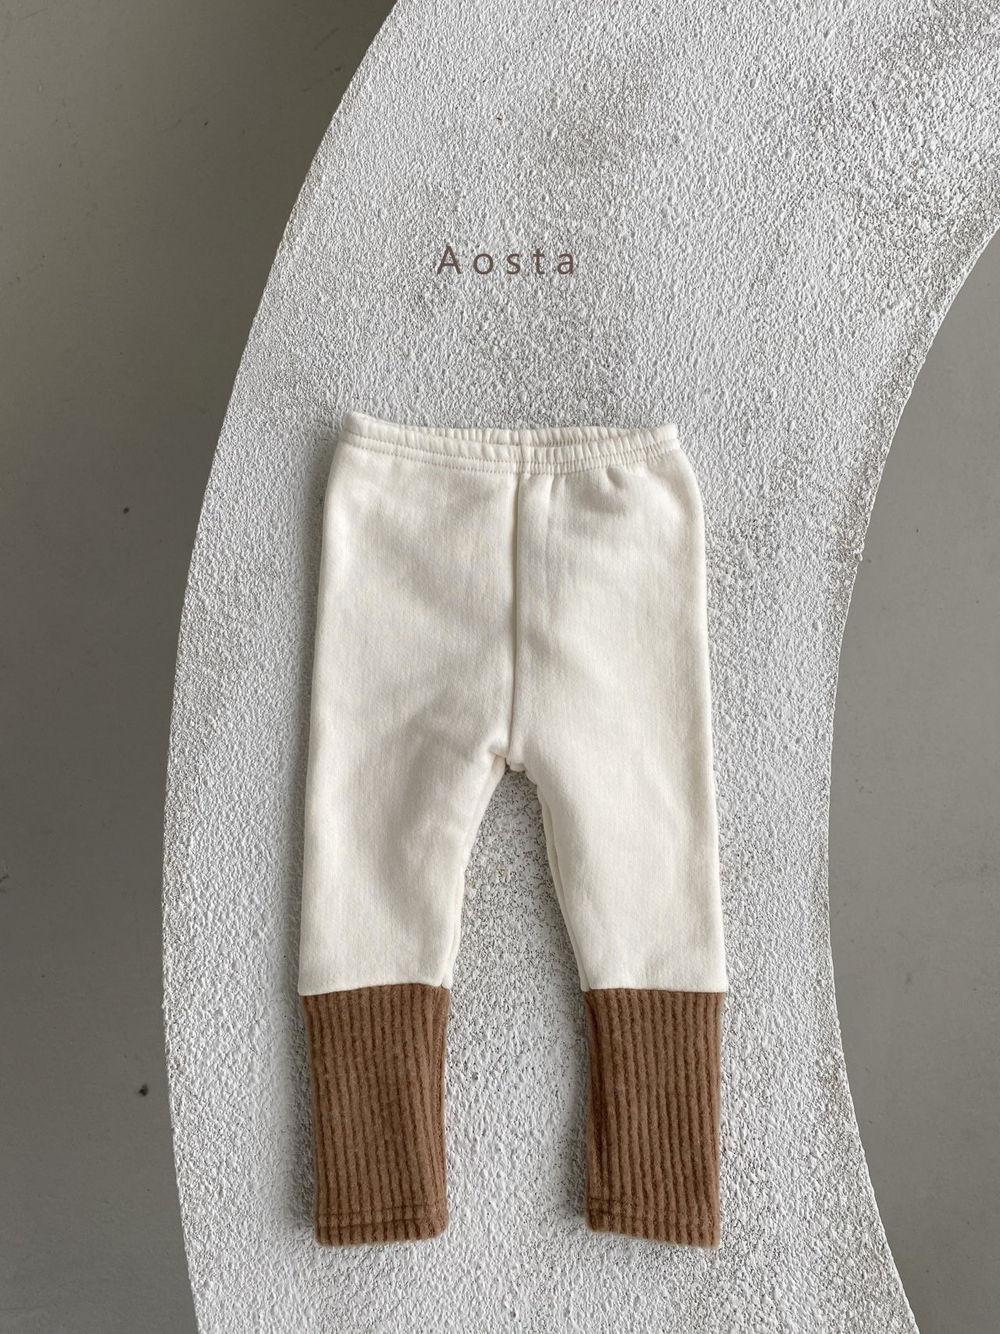 AOSTA - Korean Children Fashion - #Kfashion4kids - Warmer Leggings - 2